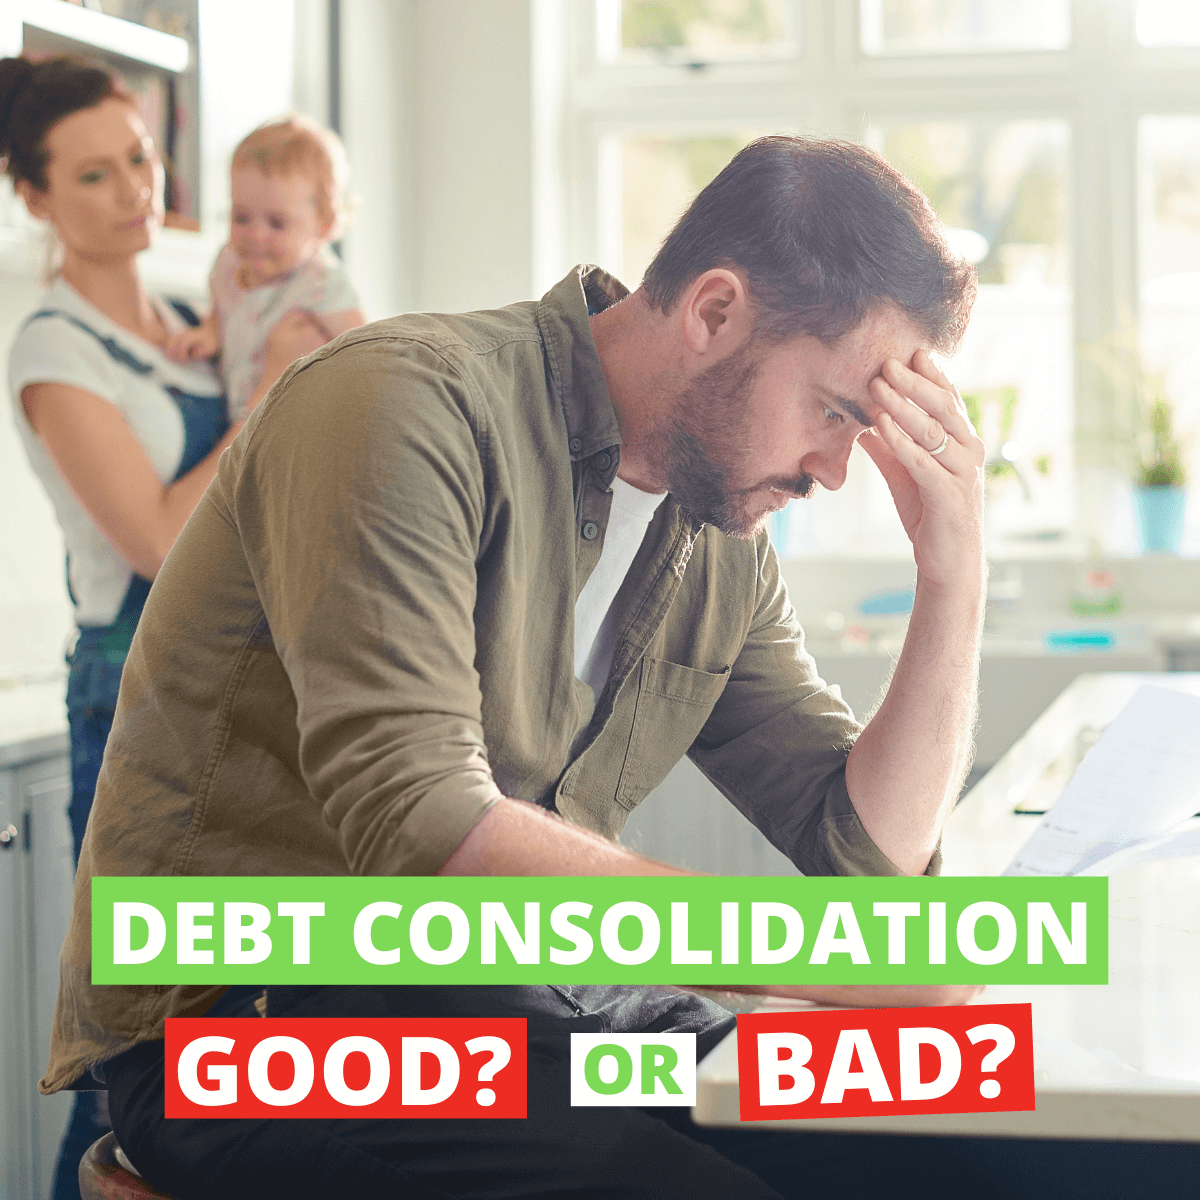 Are All Debt Consolidation Programs Legitimate?